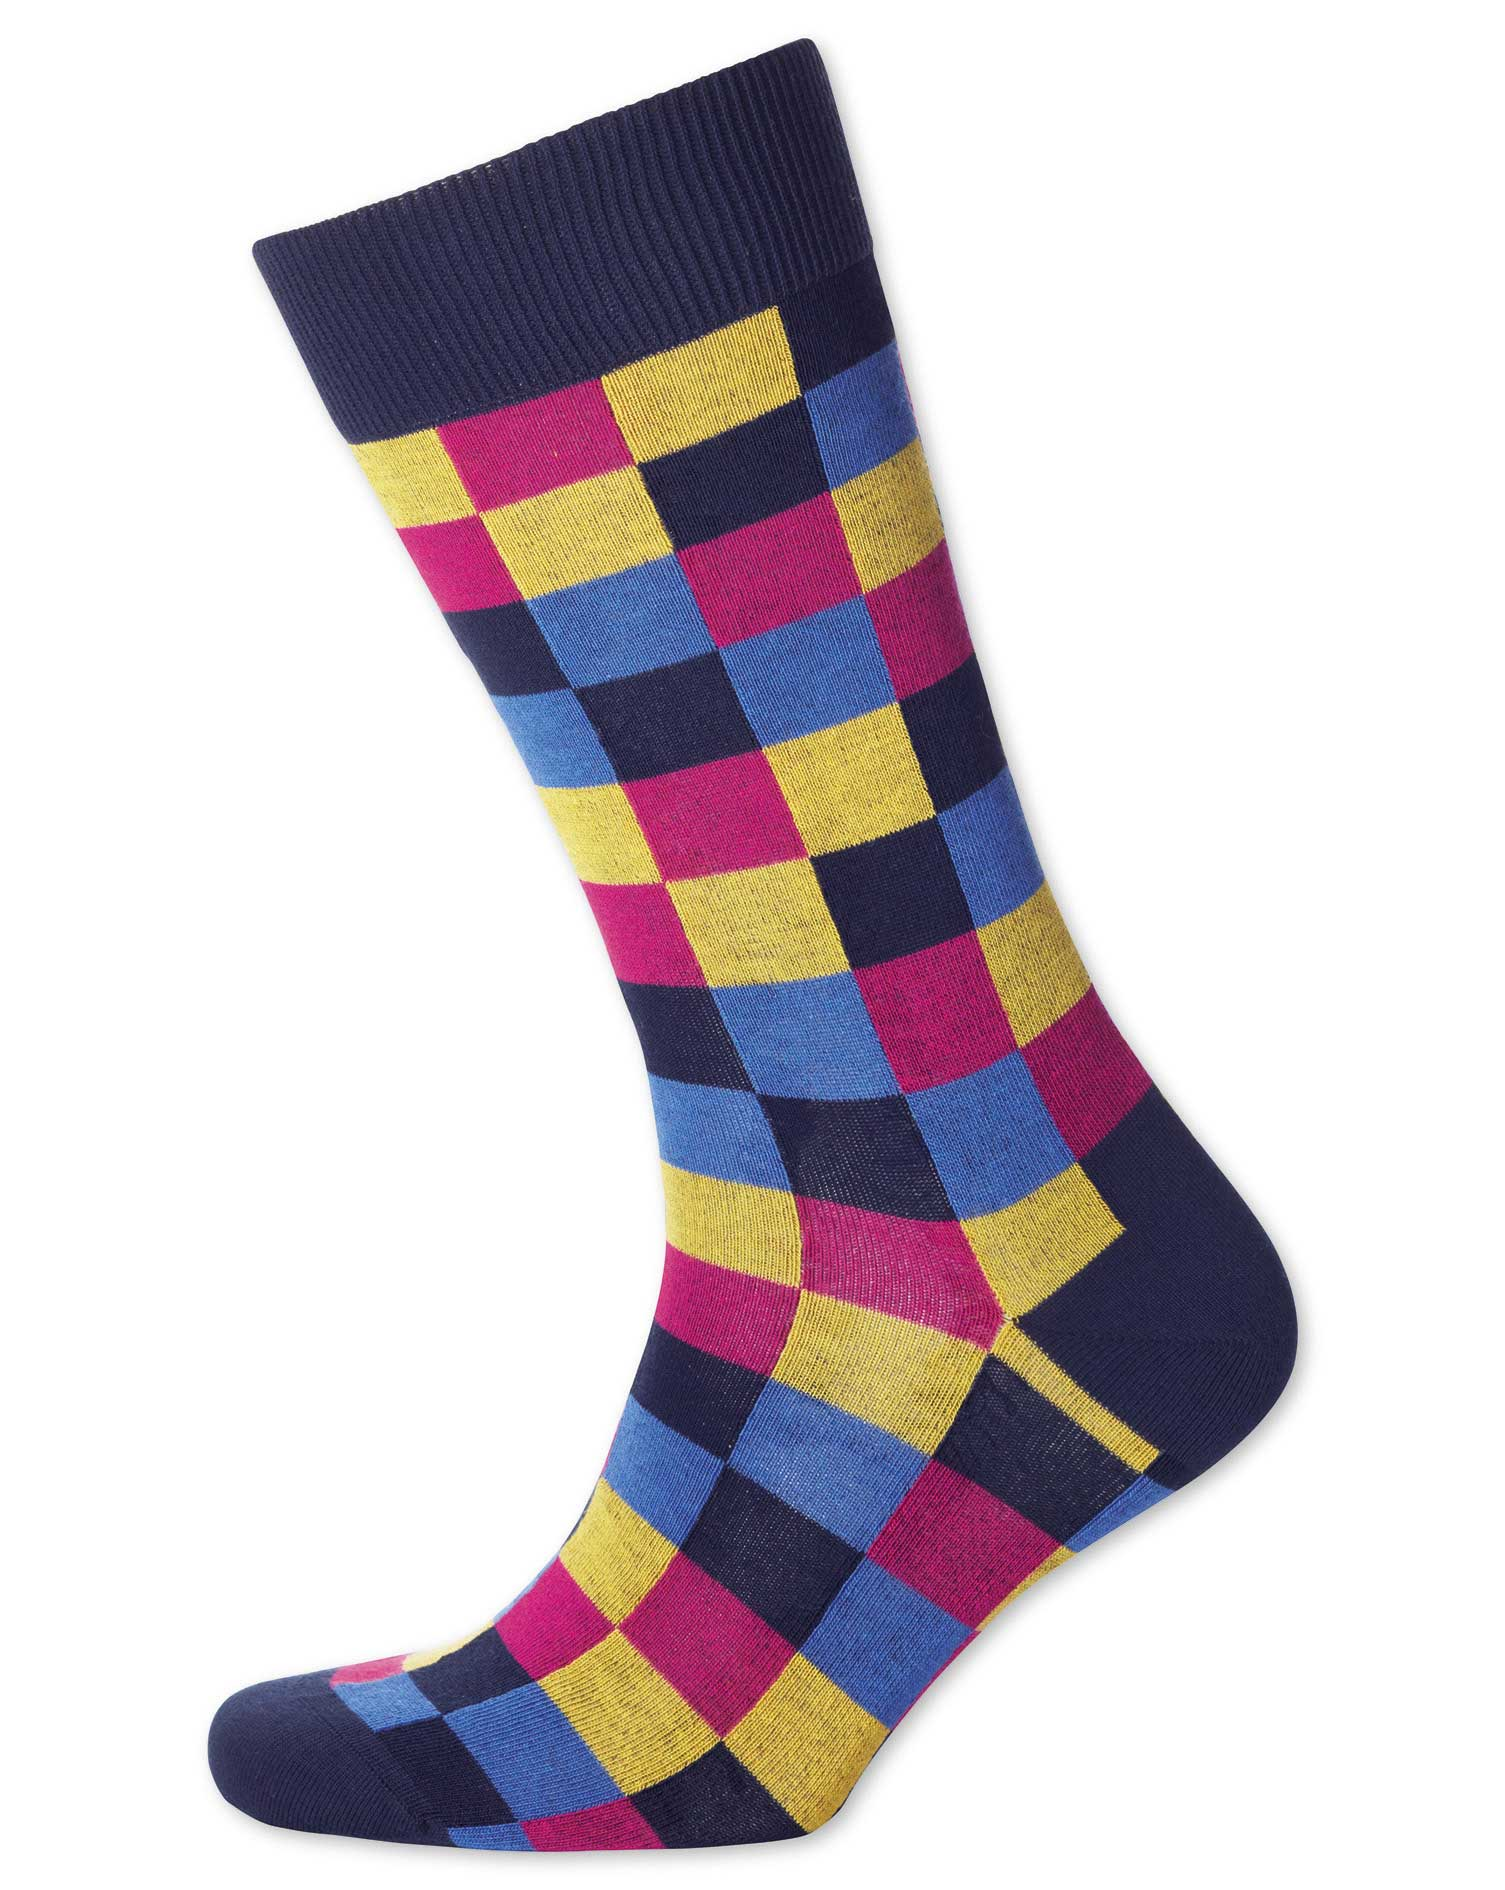 Pink and Yellow Multi Check Socks Size Medium by Charles Tyrwhitt